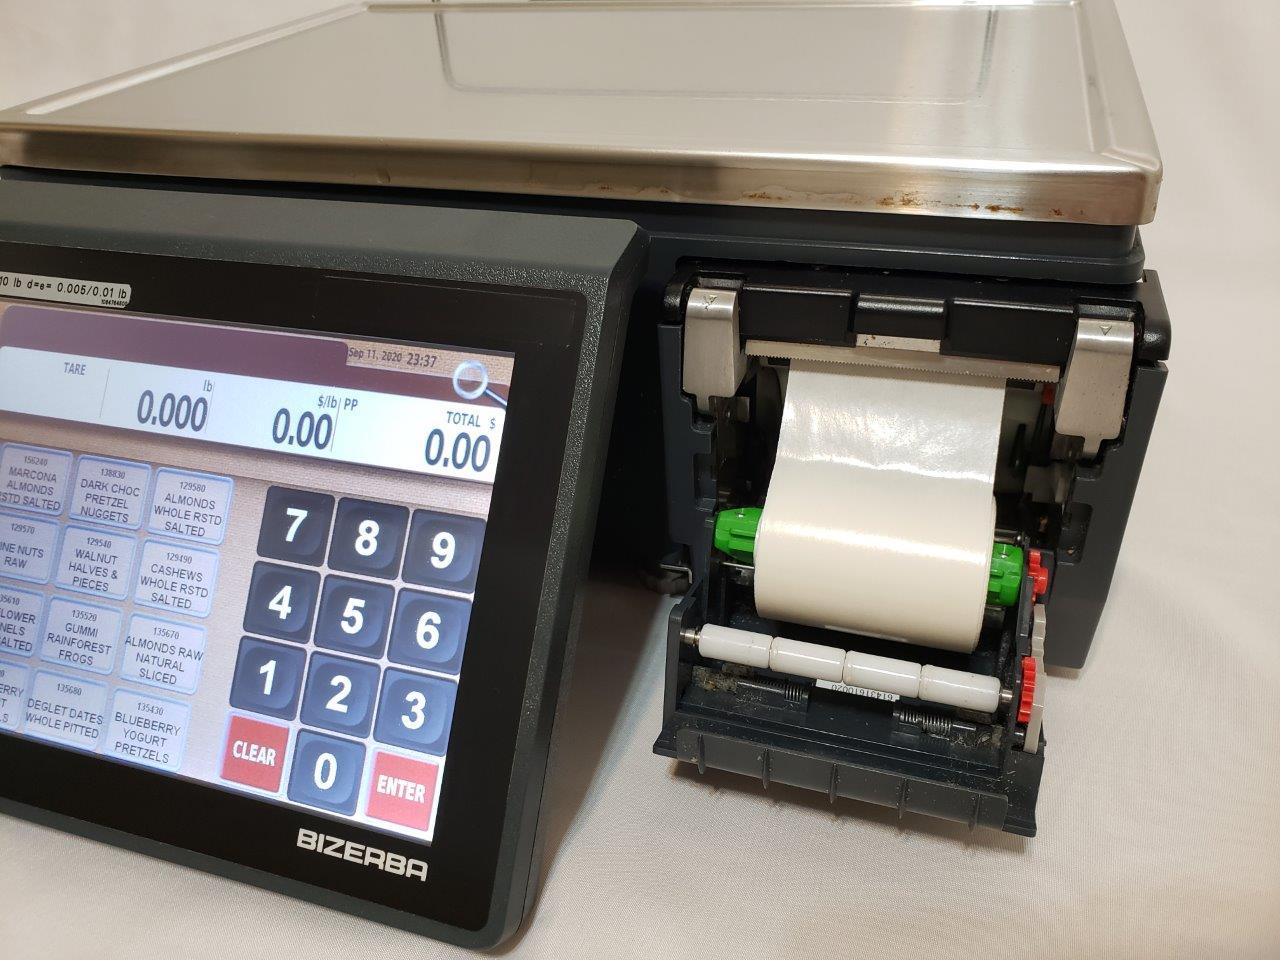 Bizerba Multimedia Scale XC 100 with 3-in-1 Printer